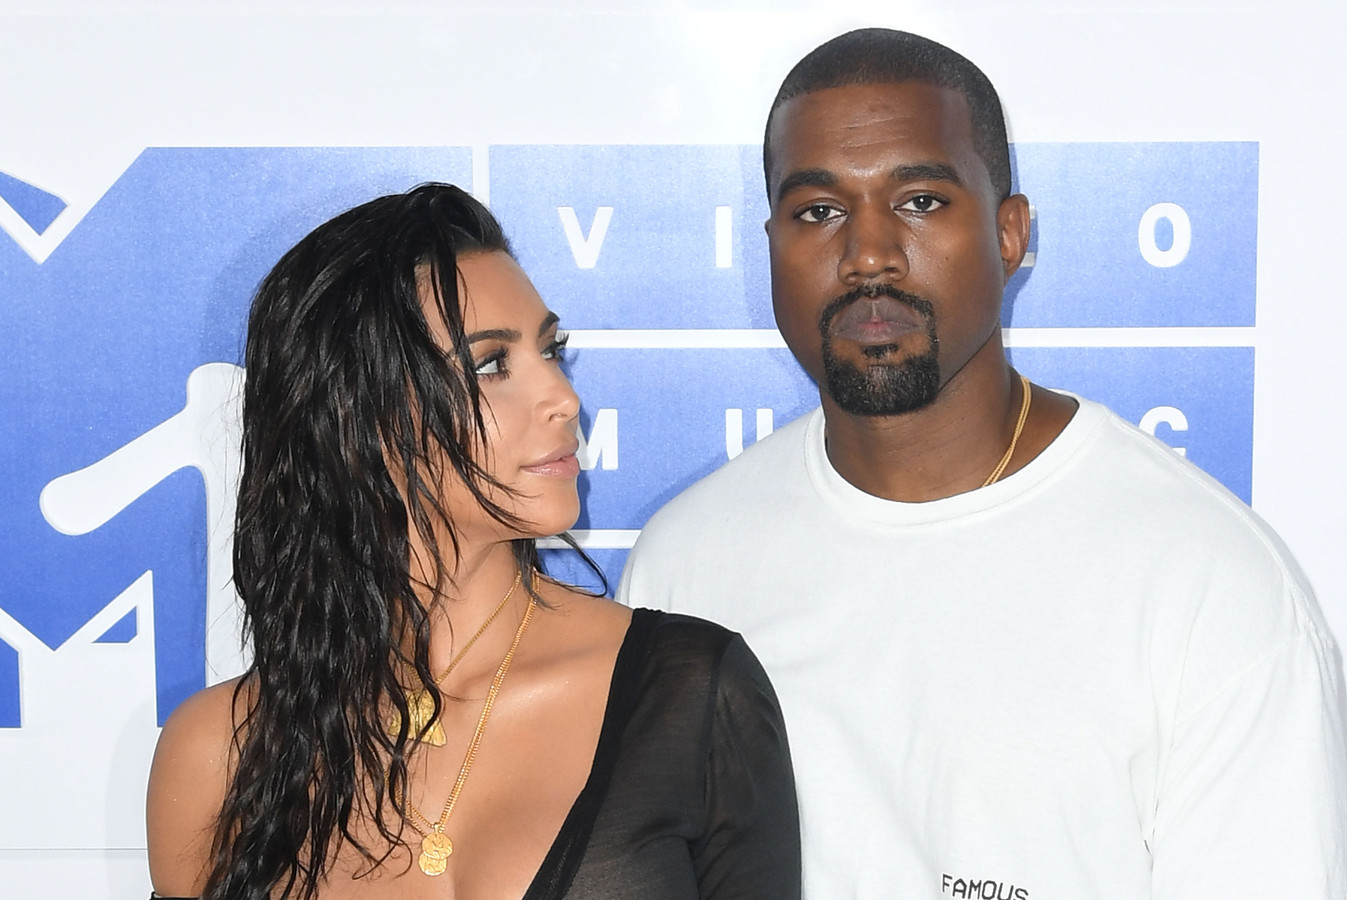 Kanye West en Kim Kardashian gaan scheiden.